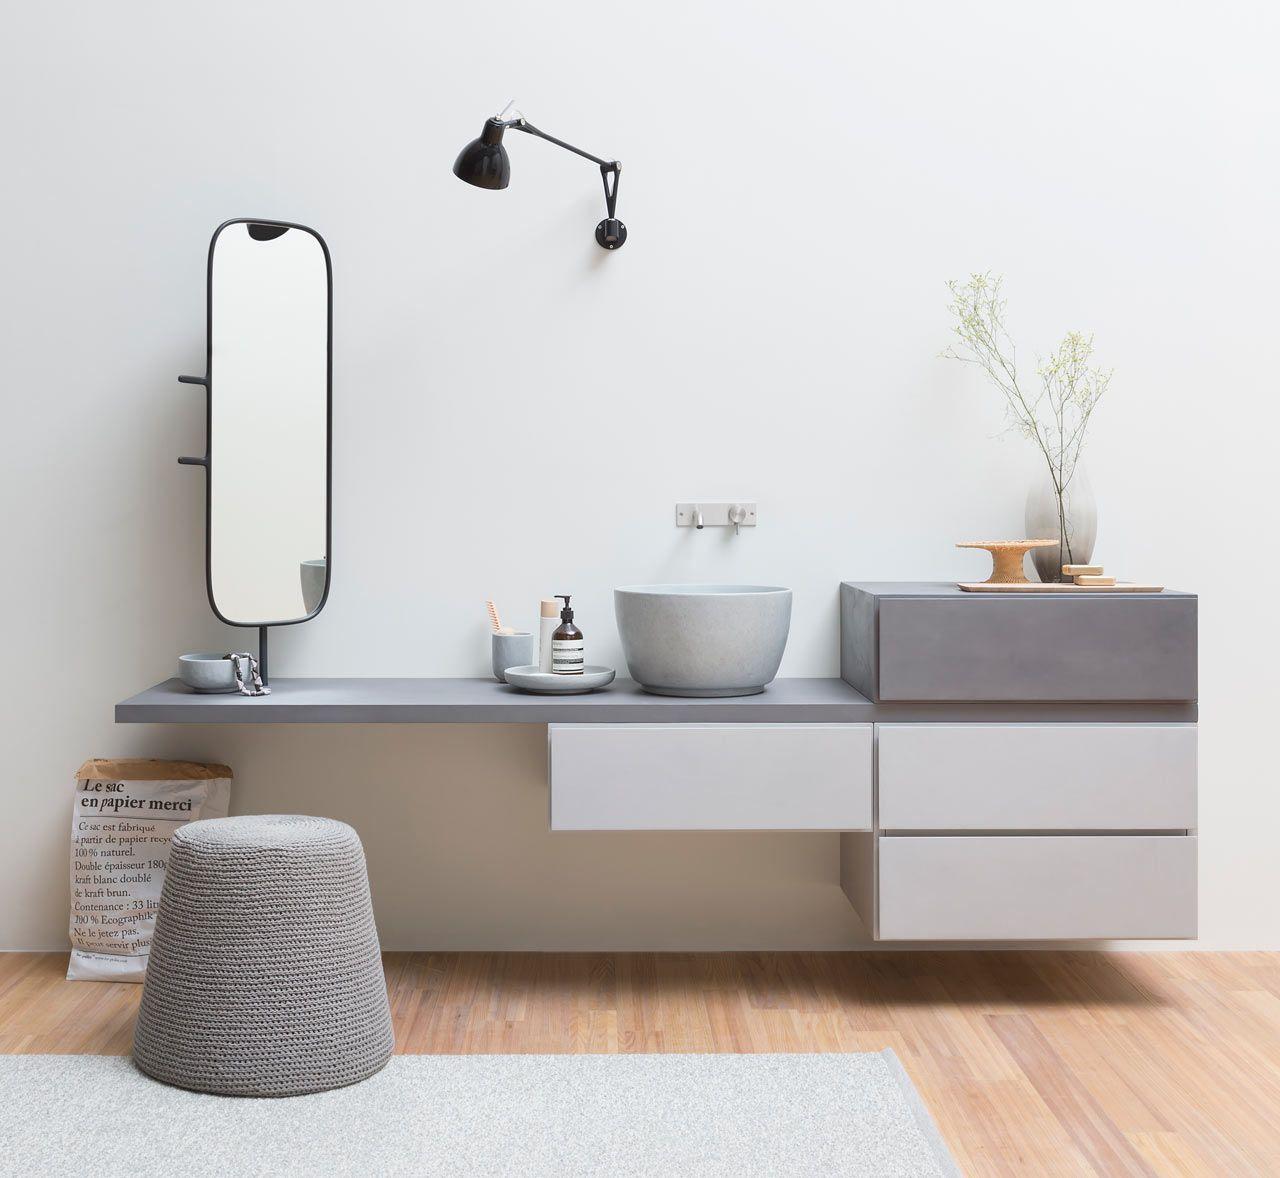 Rexadesignesperantomonicagraffeo modern bathroom